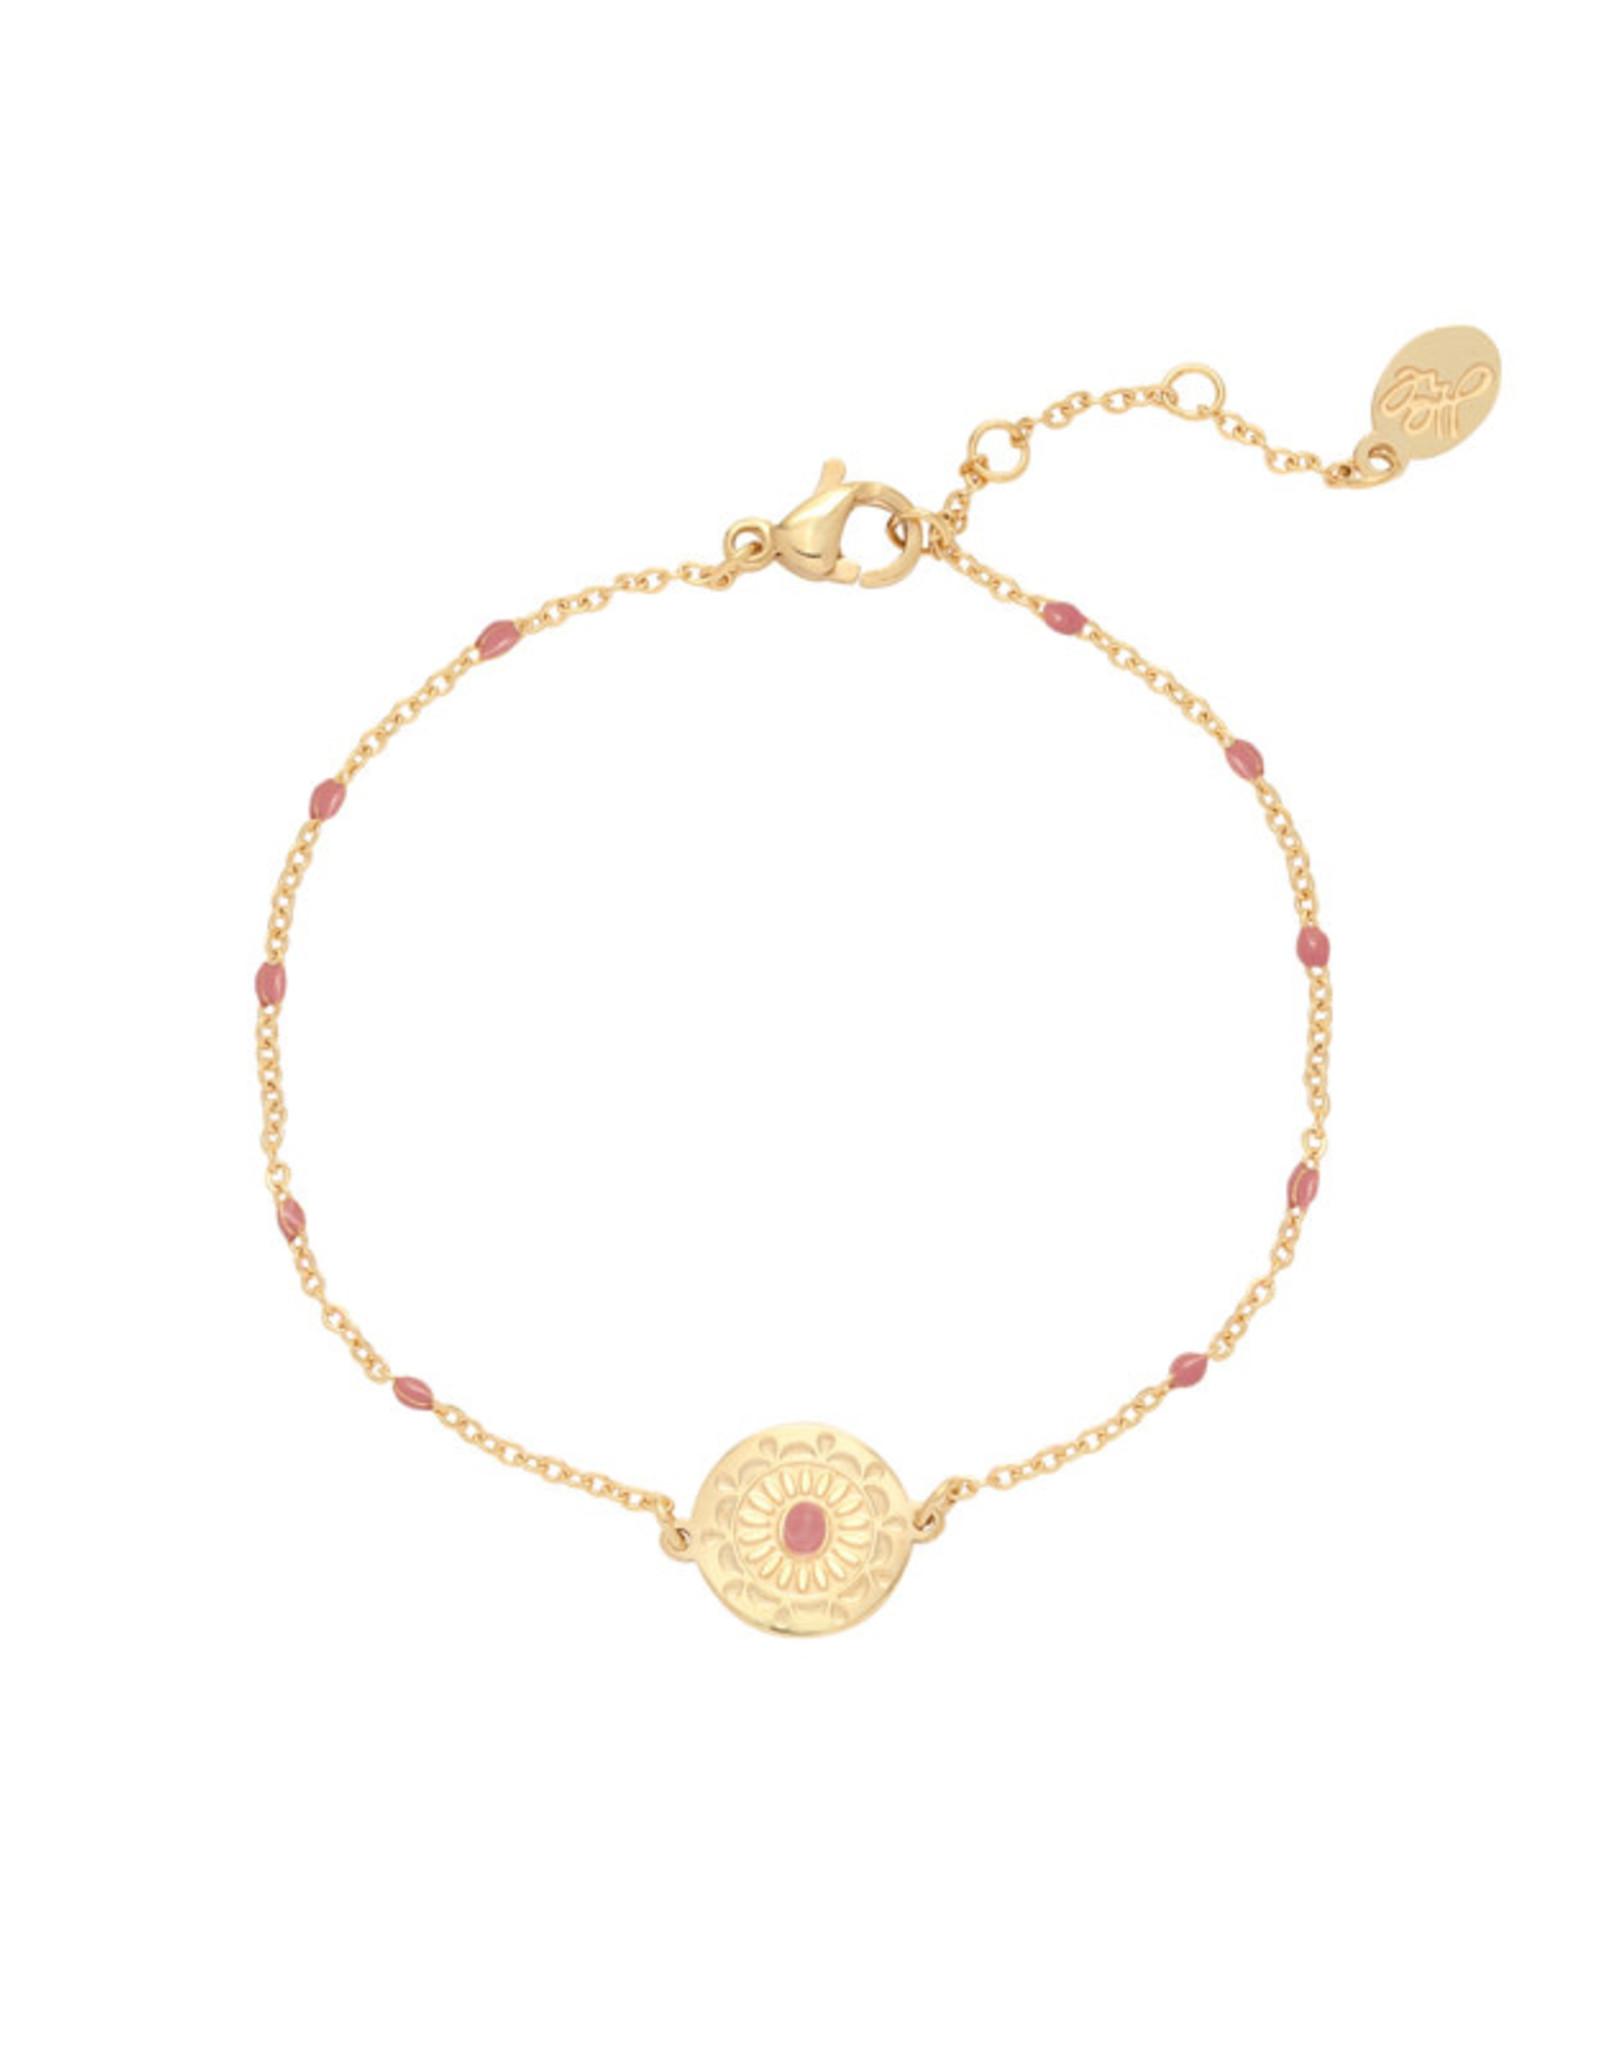 Bracelet deco coin pink